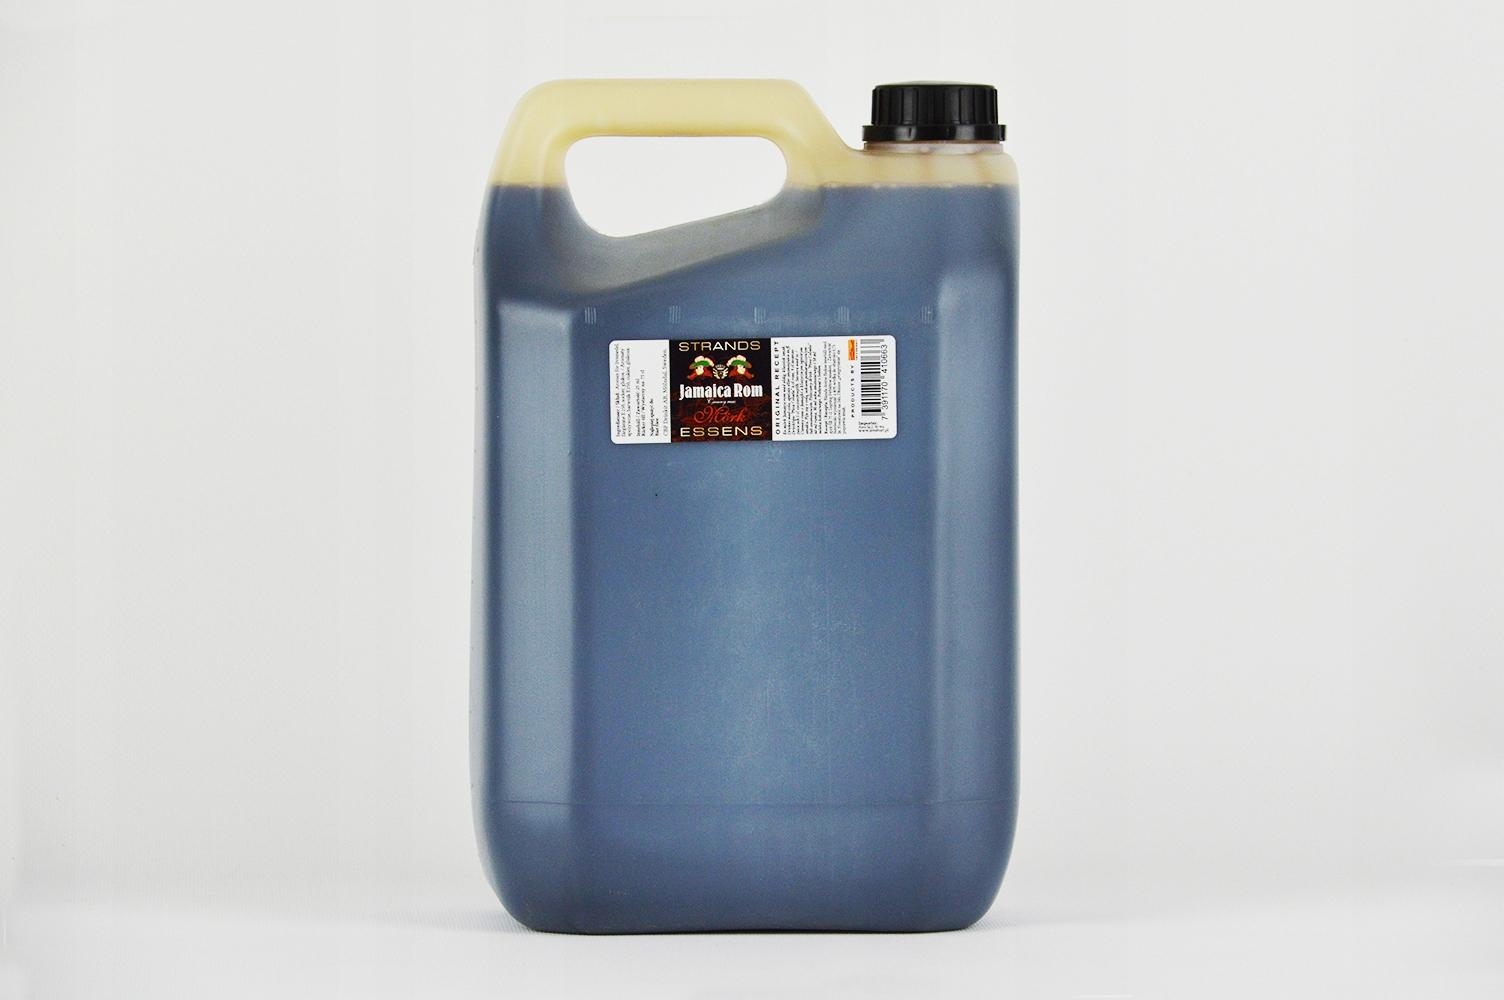 Podstatou alkoholu Pramene JAMAICA RUM 5L